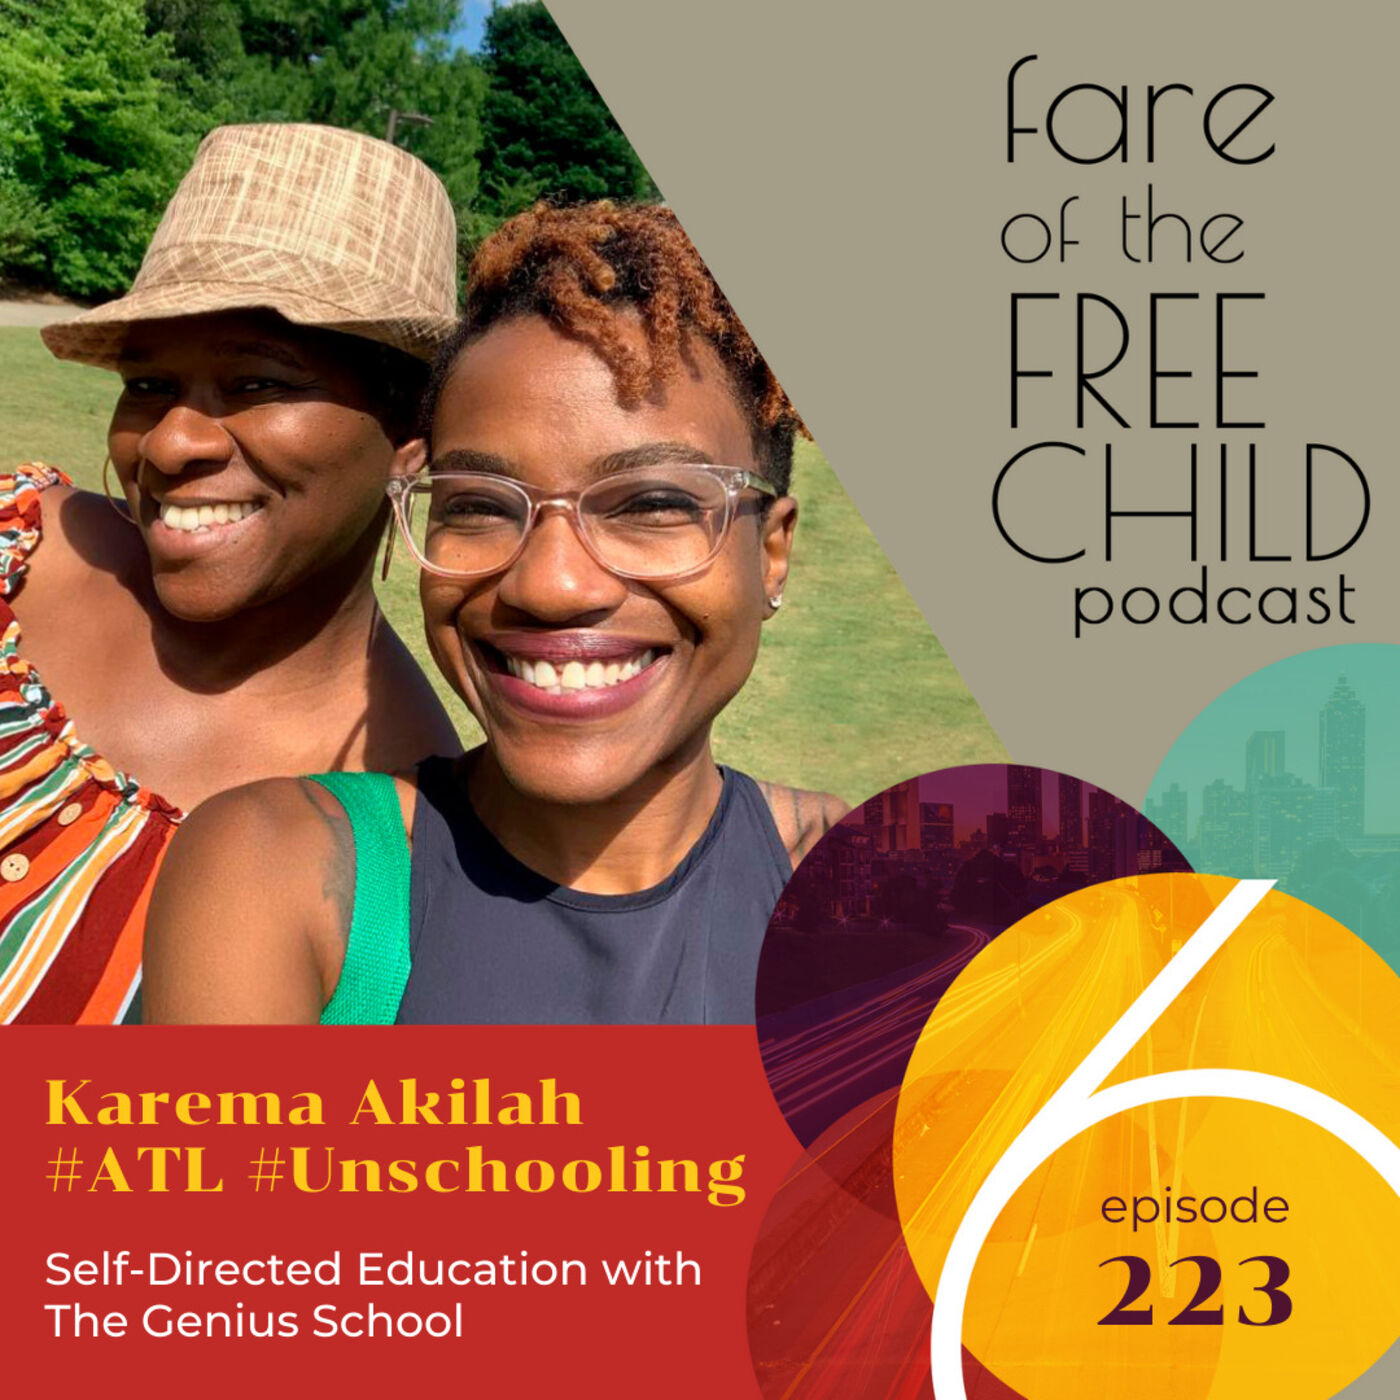 Ep 223: Karema Akilah #ATL #Unschooling